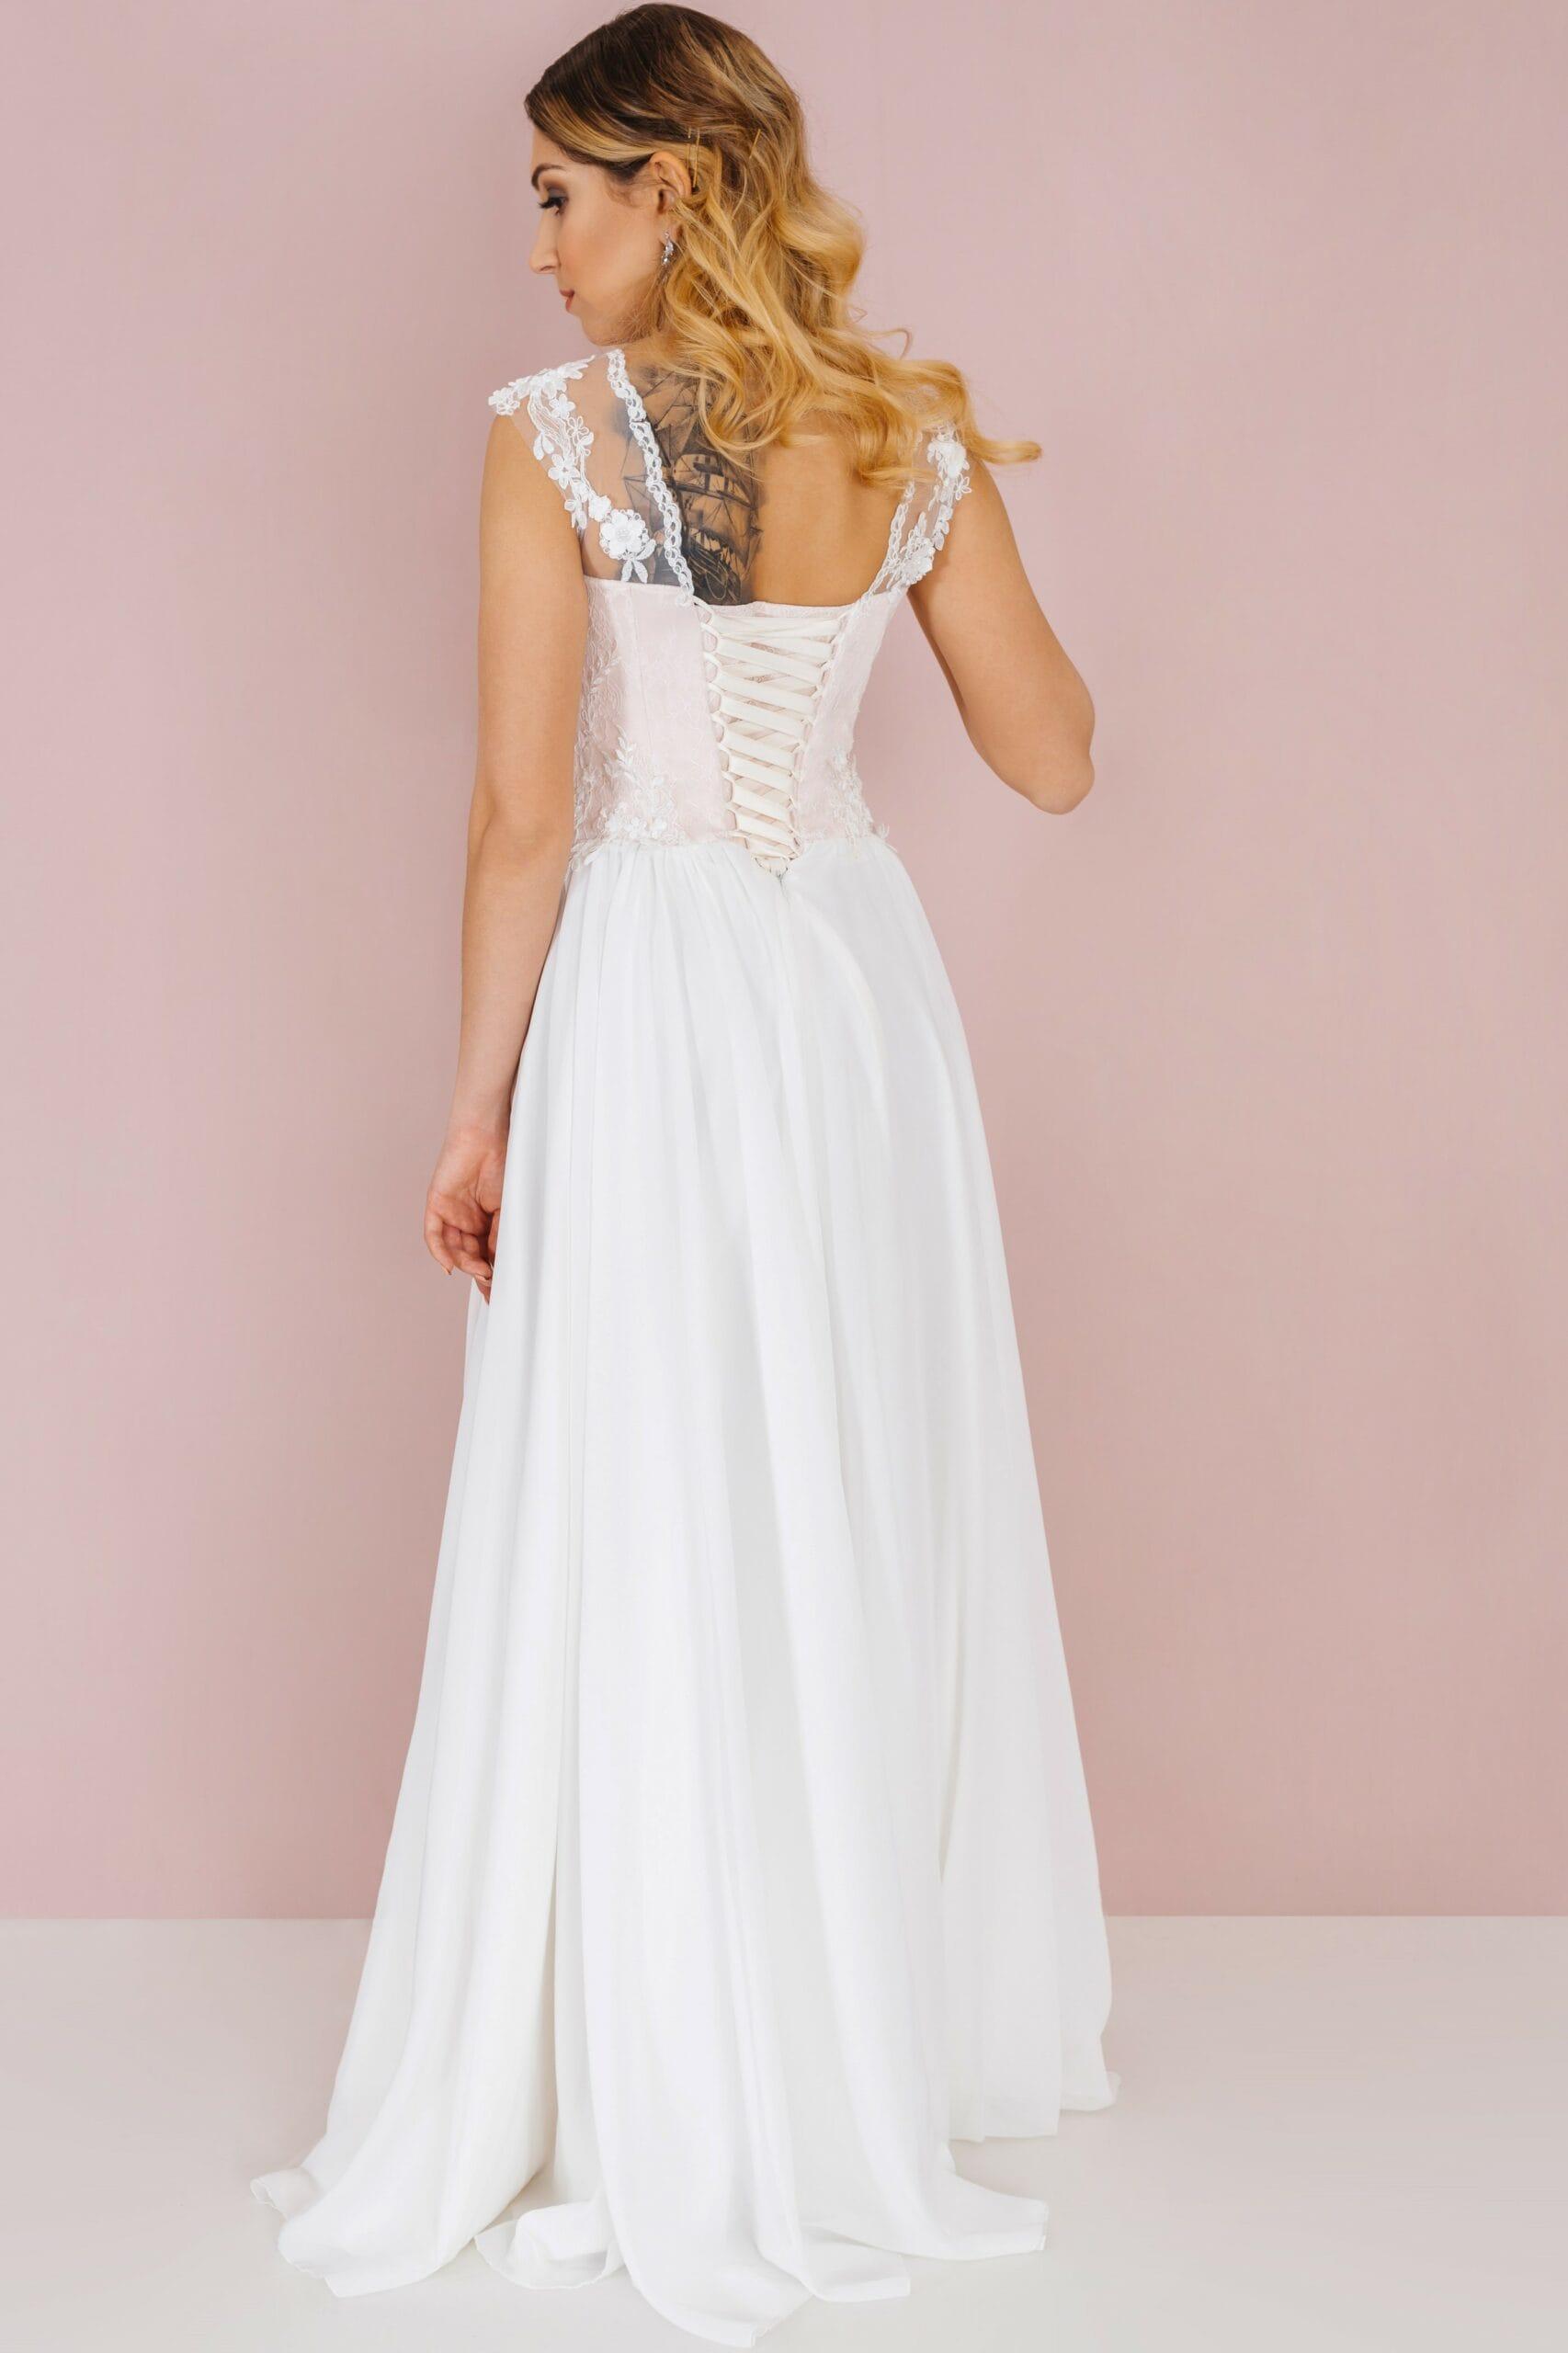 Свадебное платье SOPHIA, коллекция LOFT, бренд RARE BRIDAL, фото 2